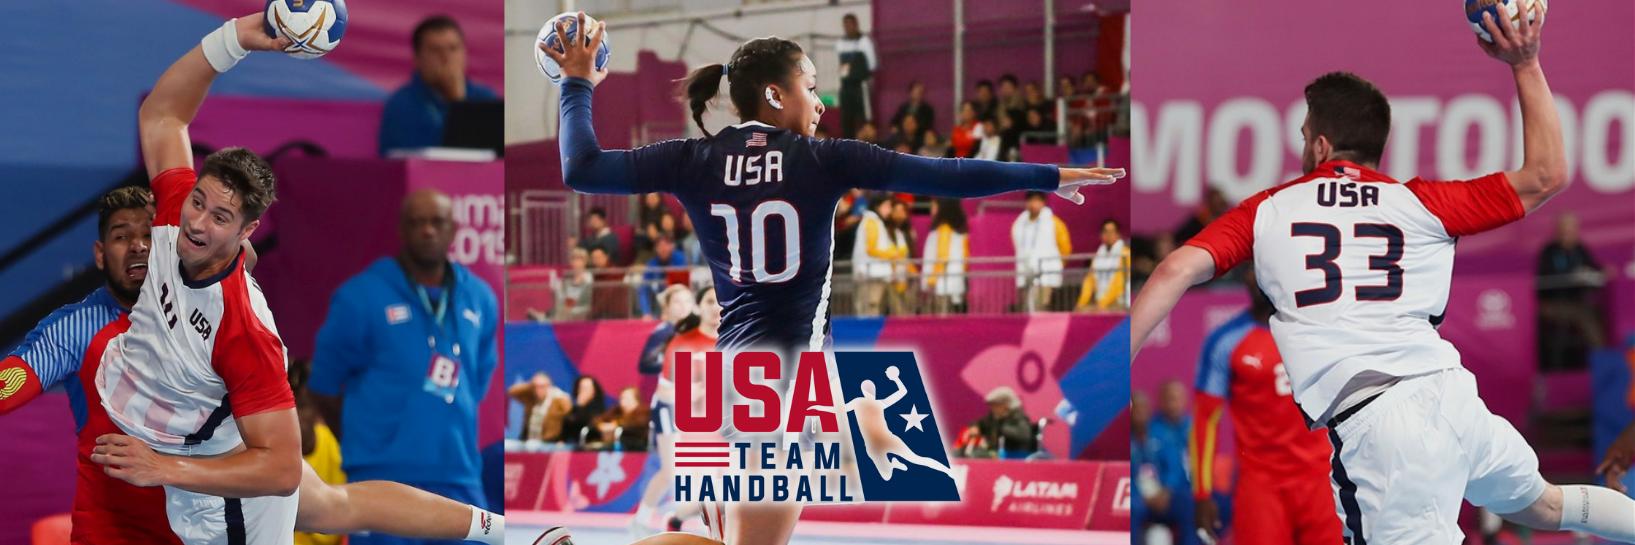 USA Team Handball Hosts Virtual Tryout For Women's National Team